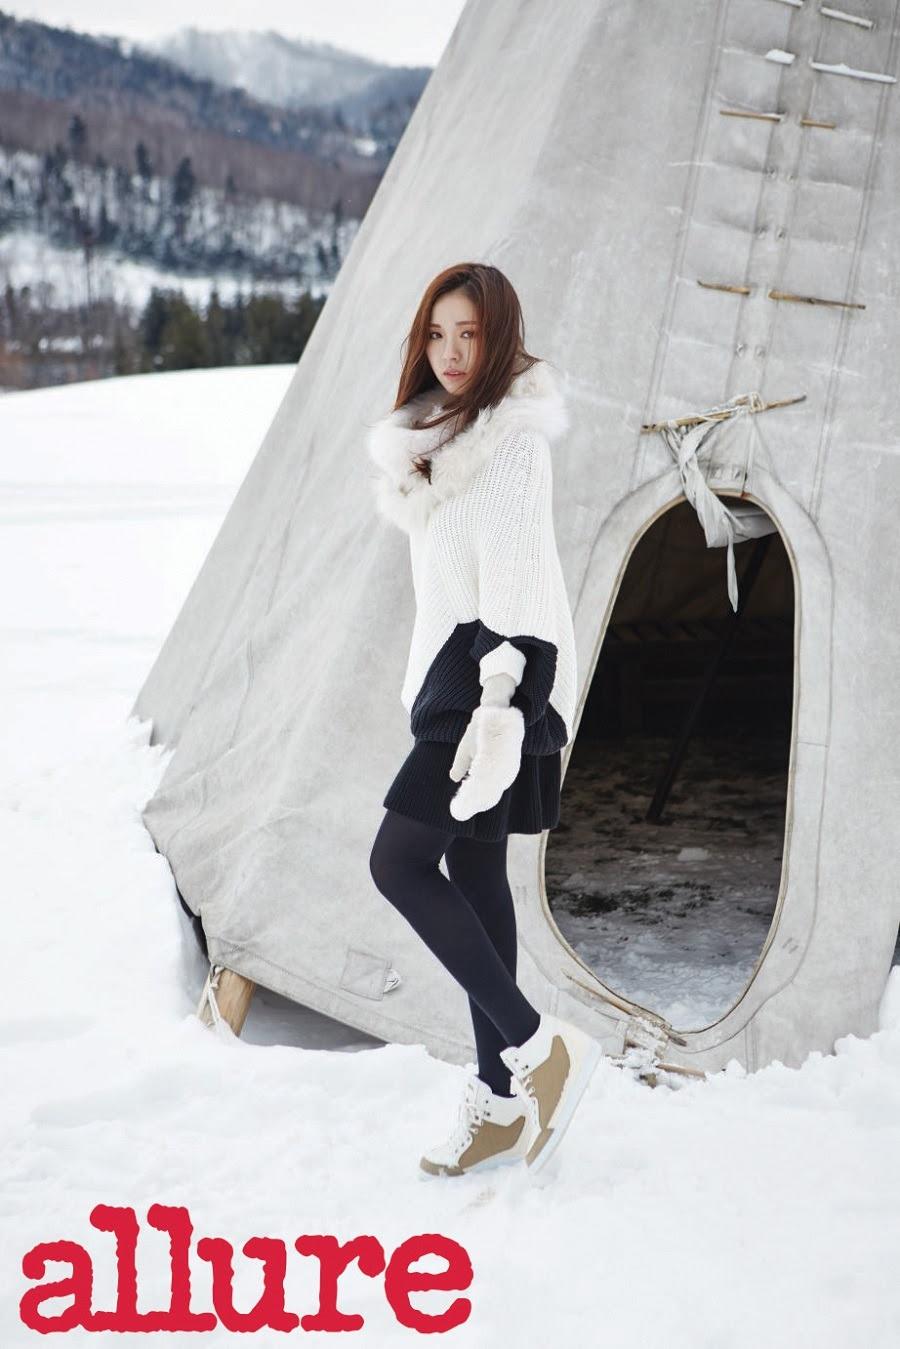 Shin Se Kyung - Allure Magazine January Issue '15